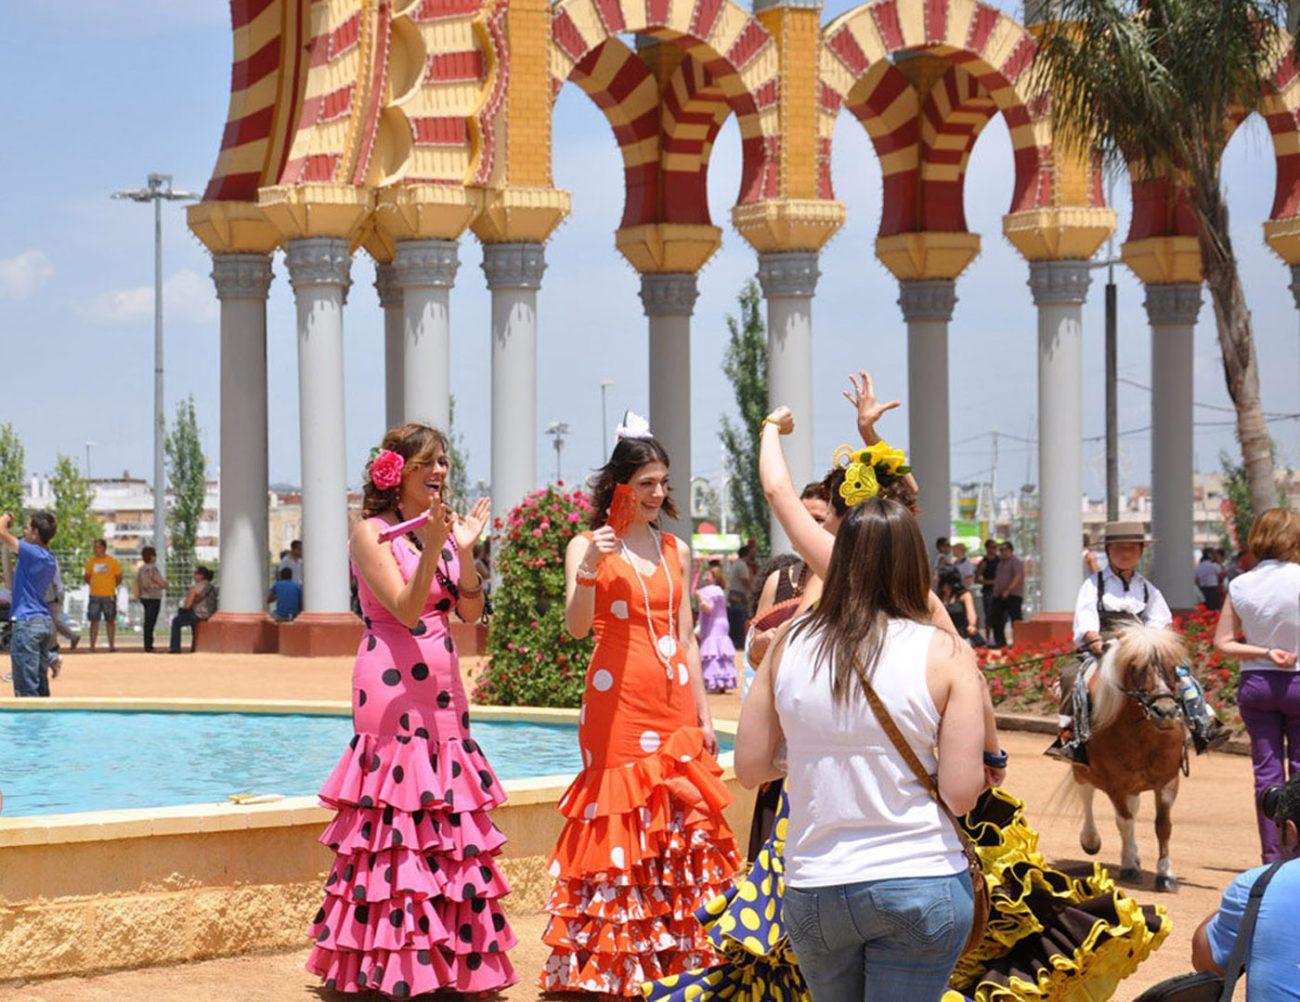 Arte y tradici n en la feria de c rdoba for Feria de artesanias cordoba 2016